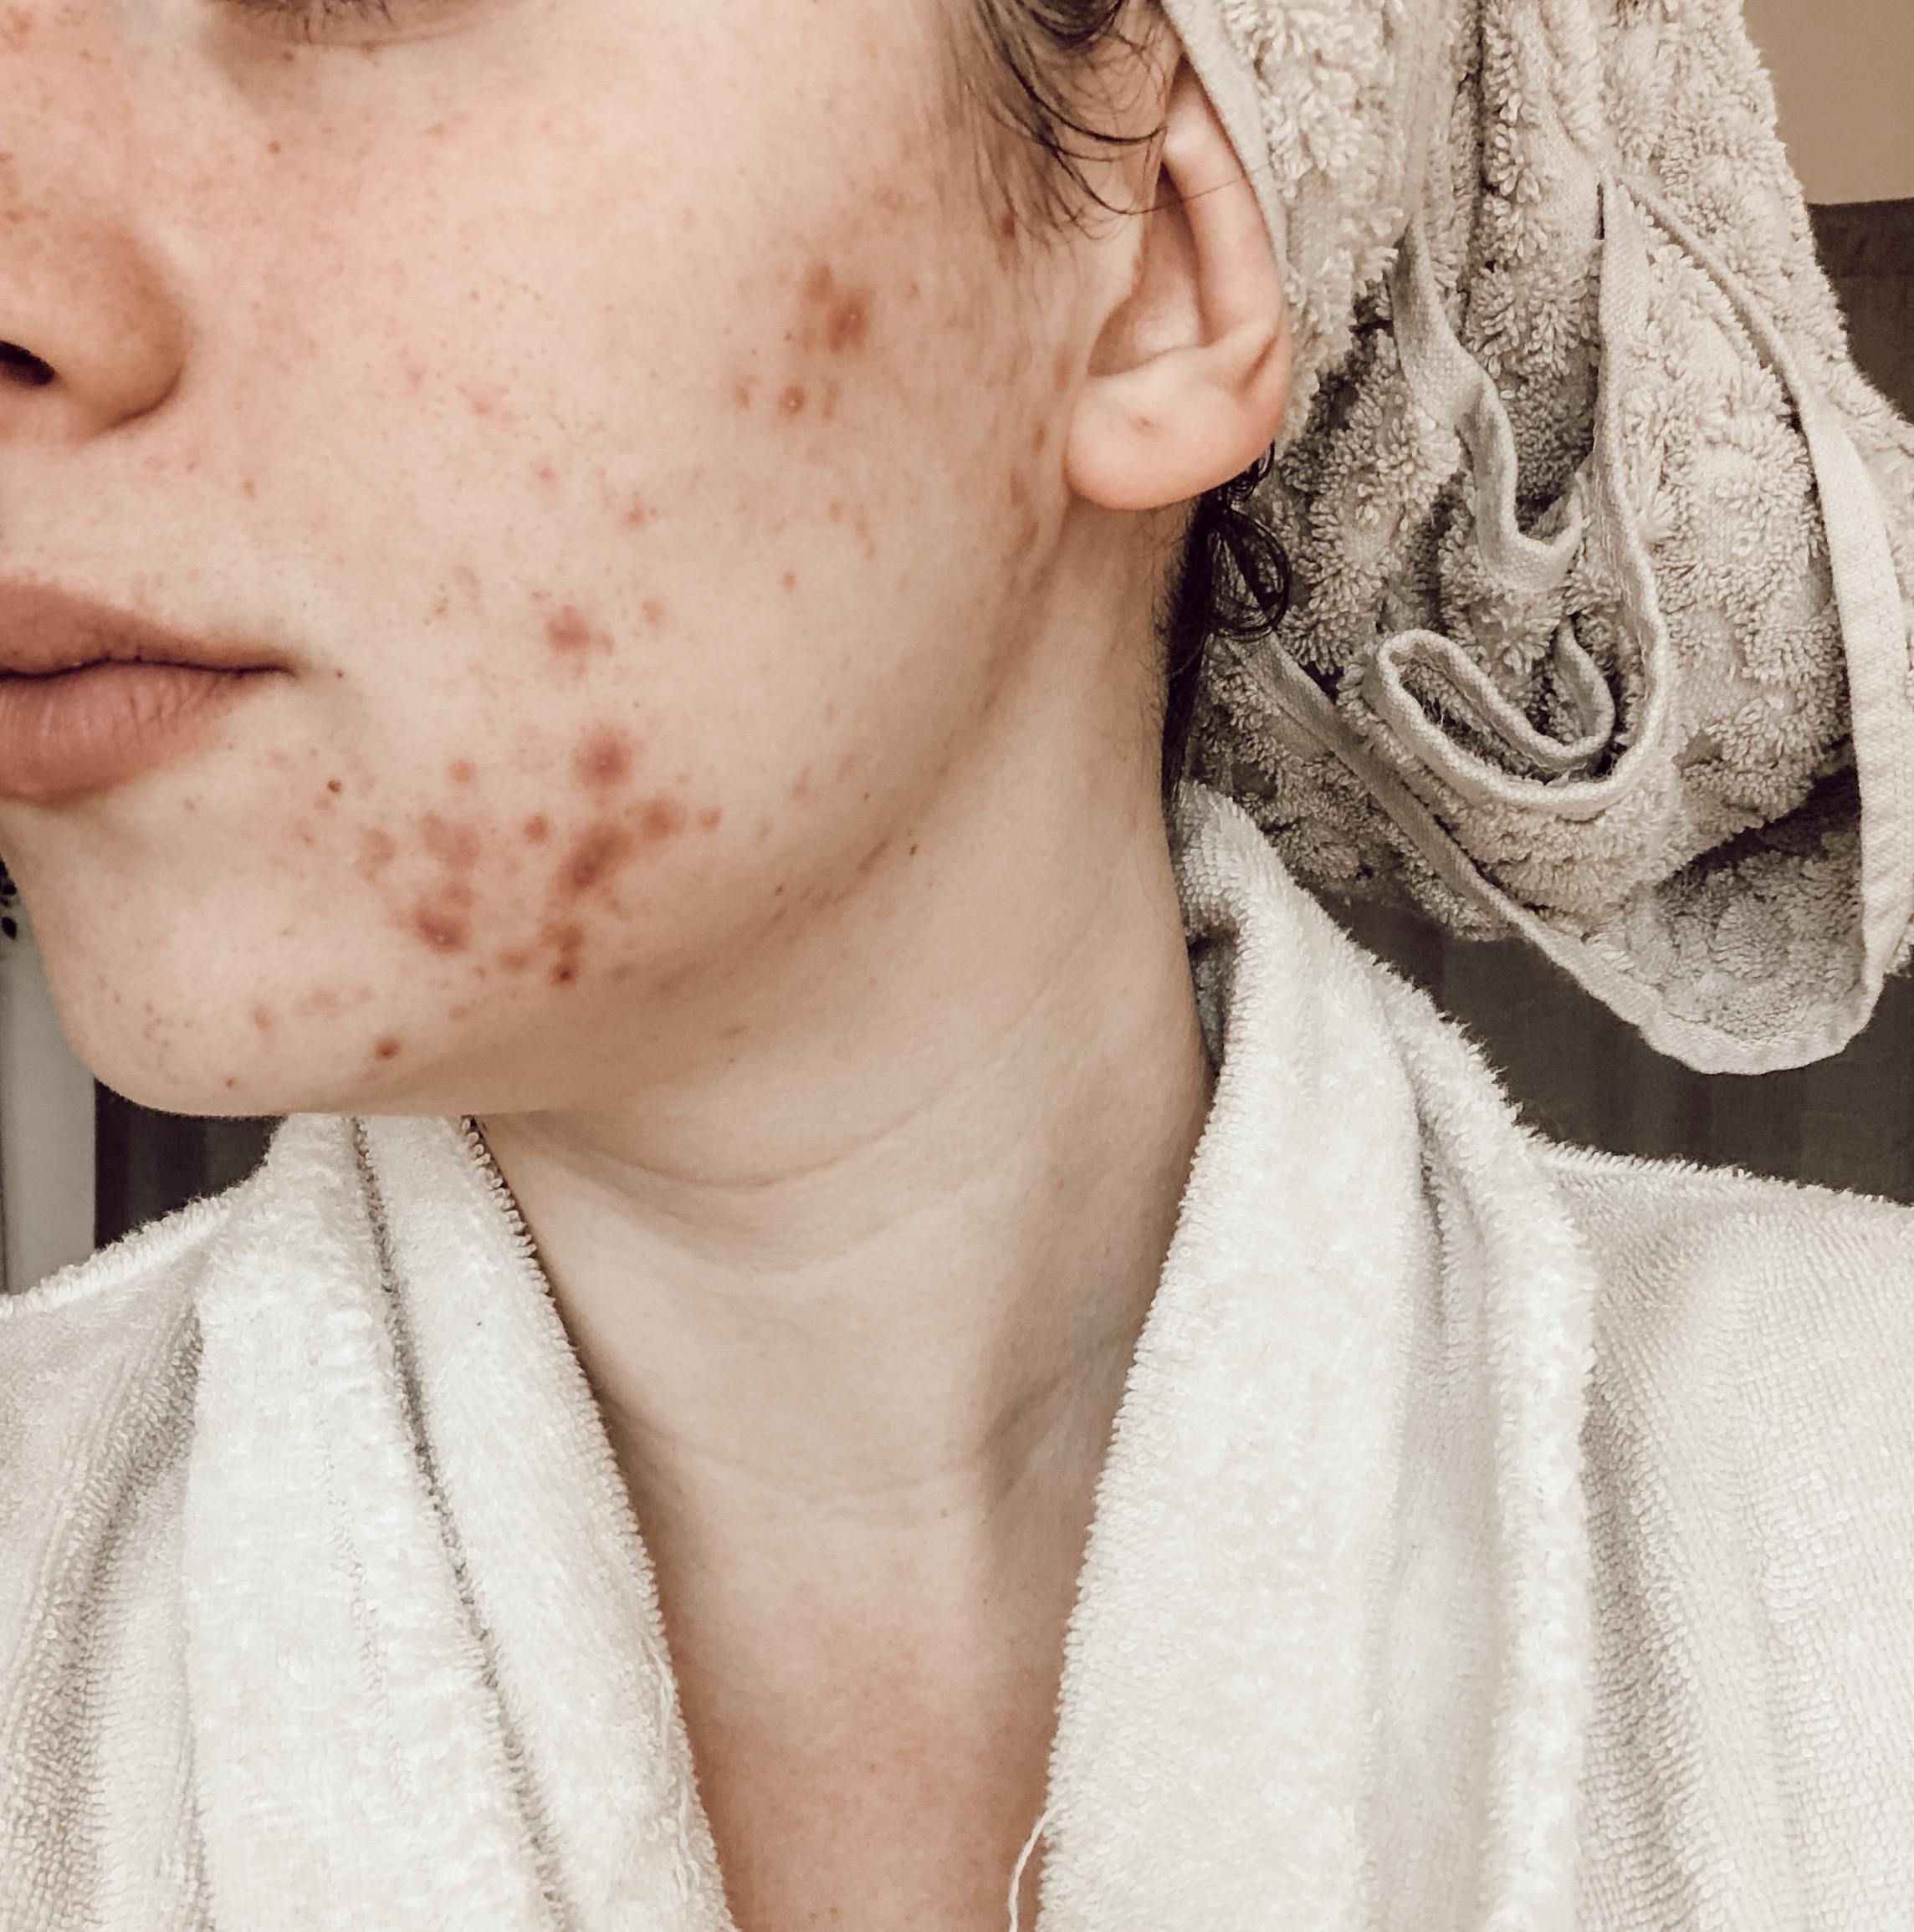 skin-breaking-out.jpg